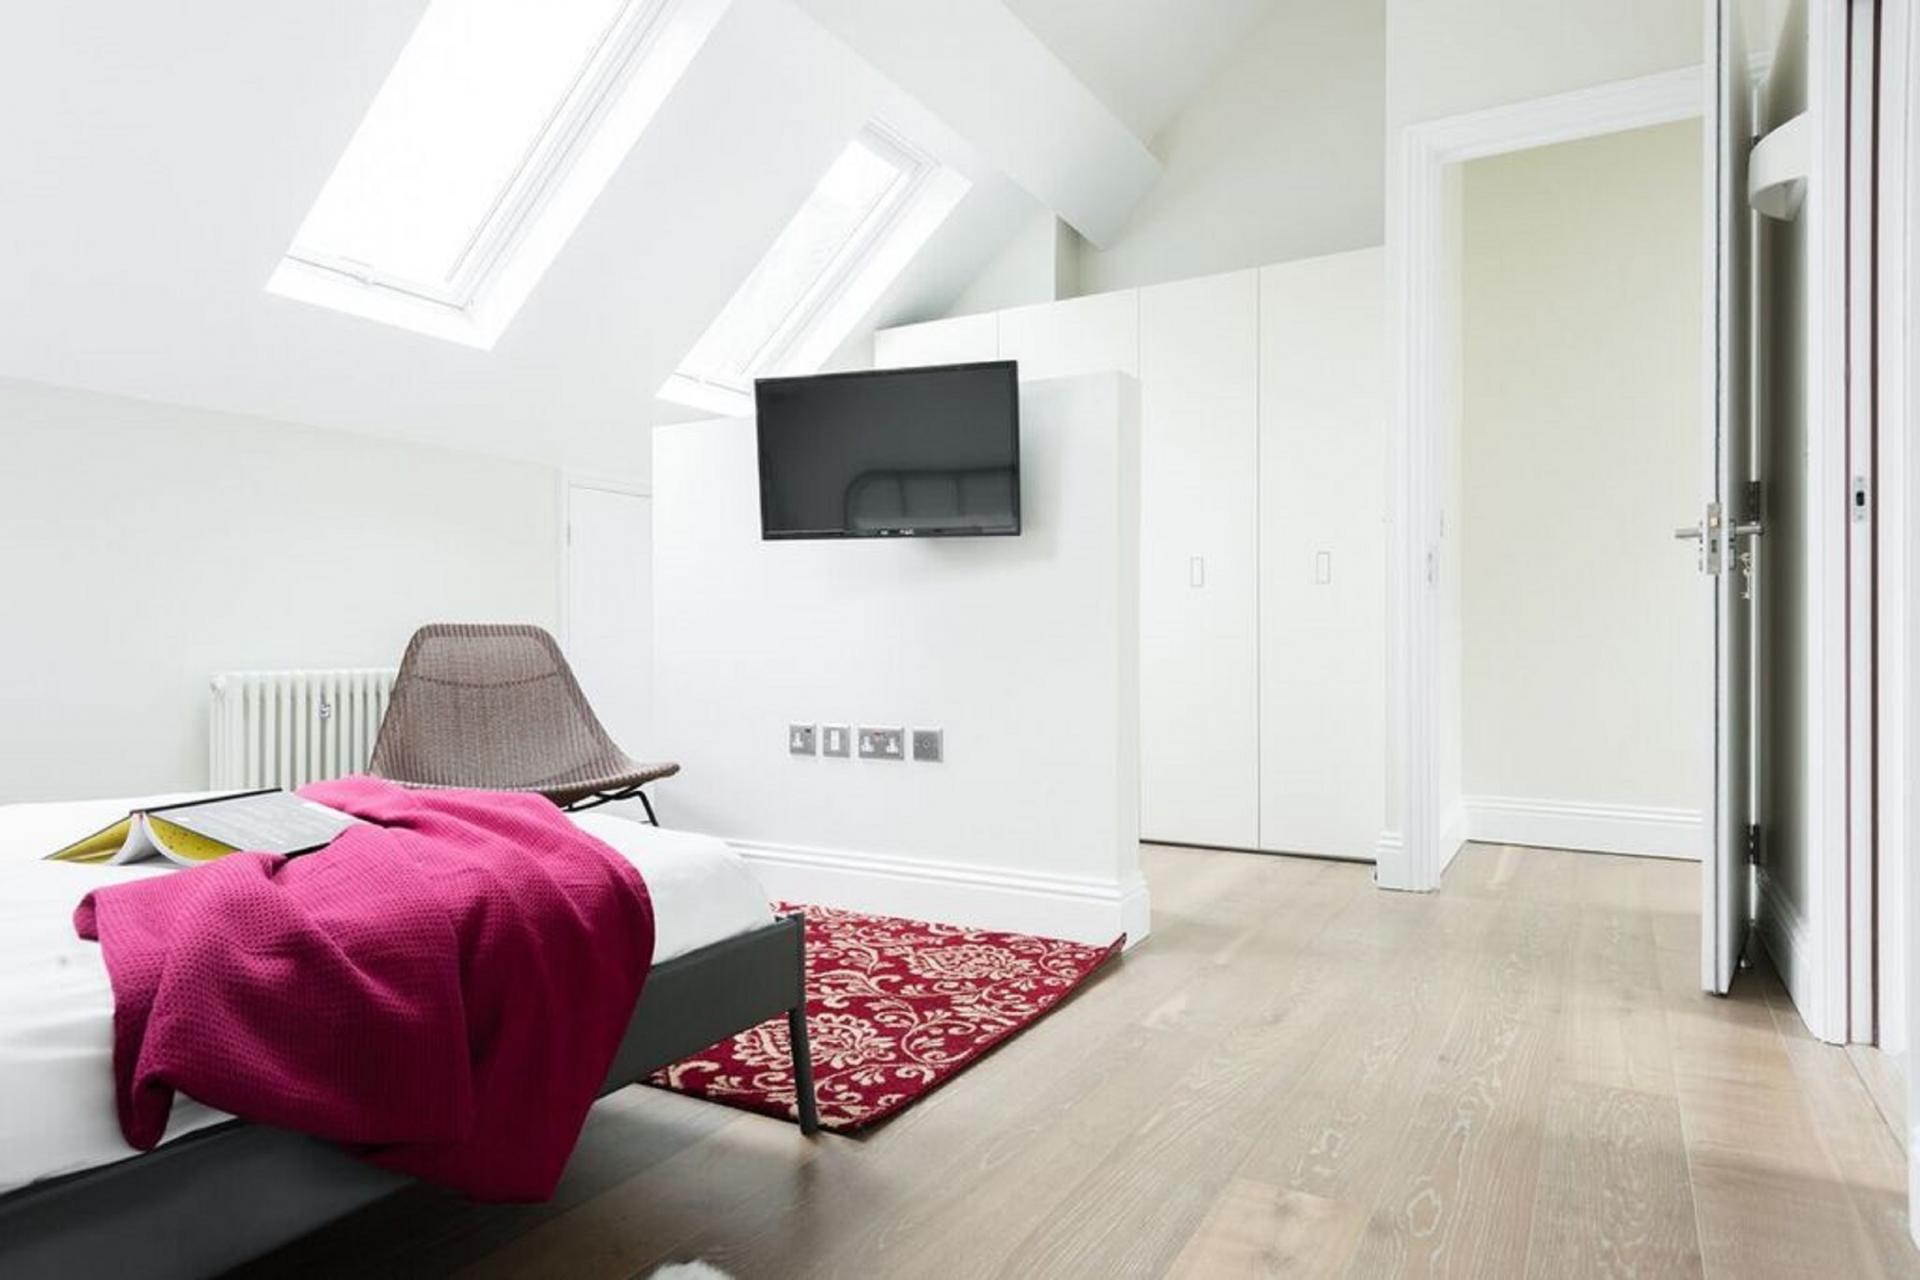 Spacious double room at The Soho Studio Apartment, Paddington, London - Citybase Apartments